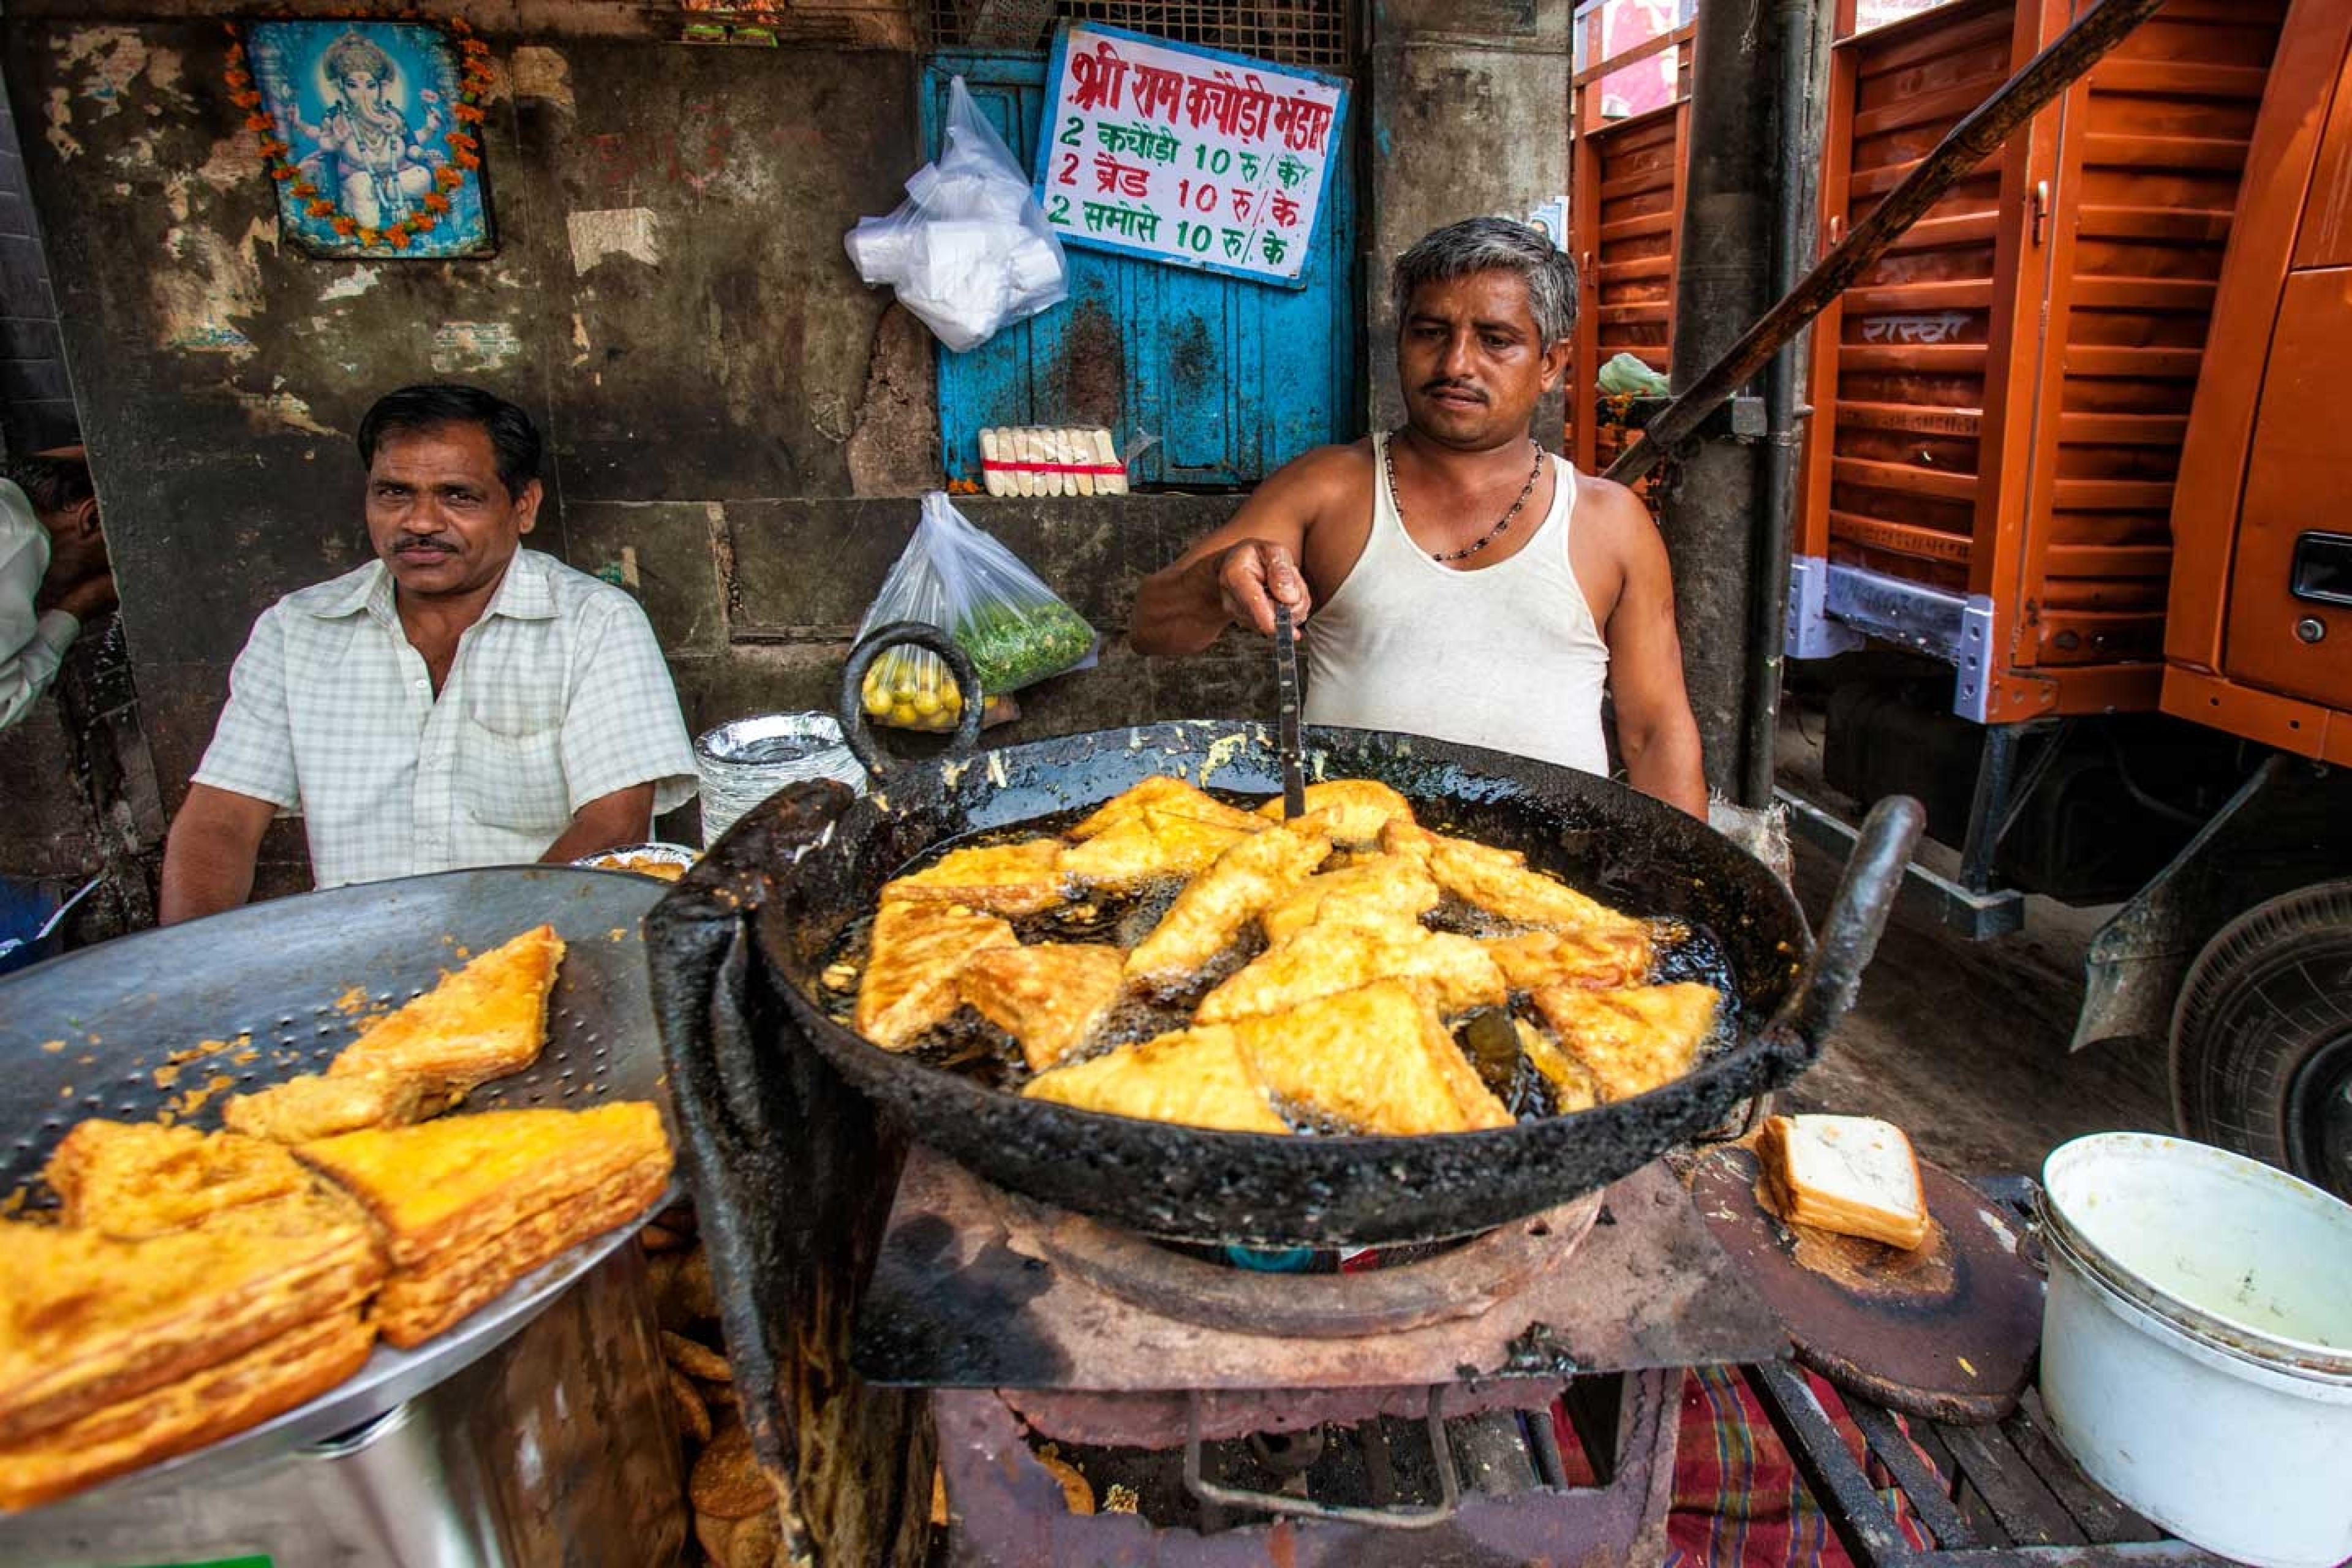 Eating Mumbai